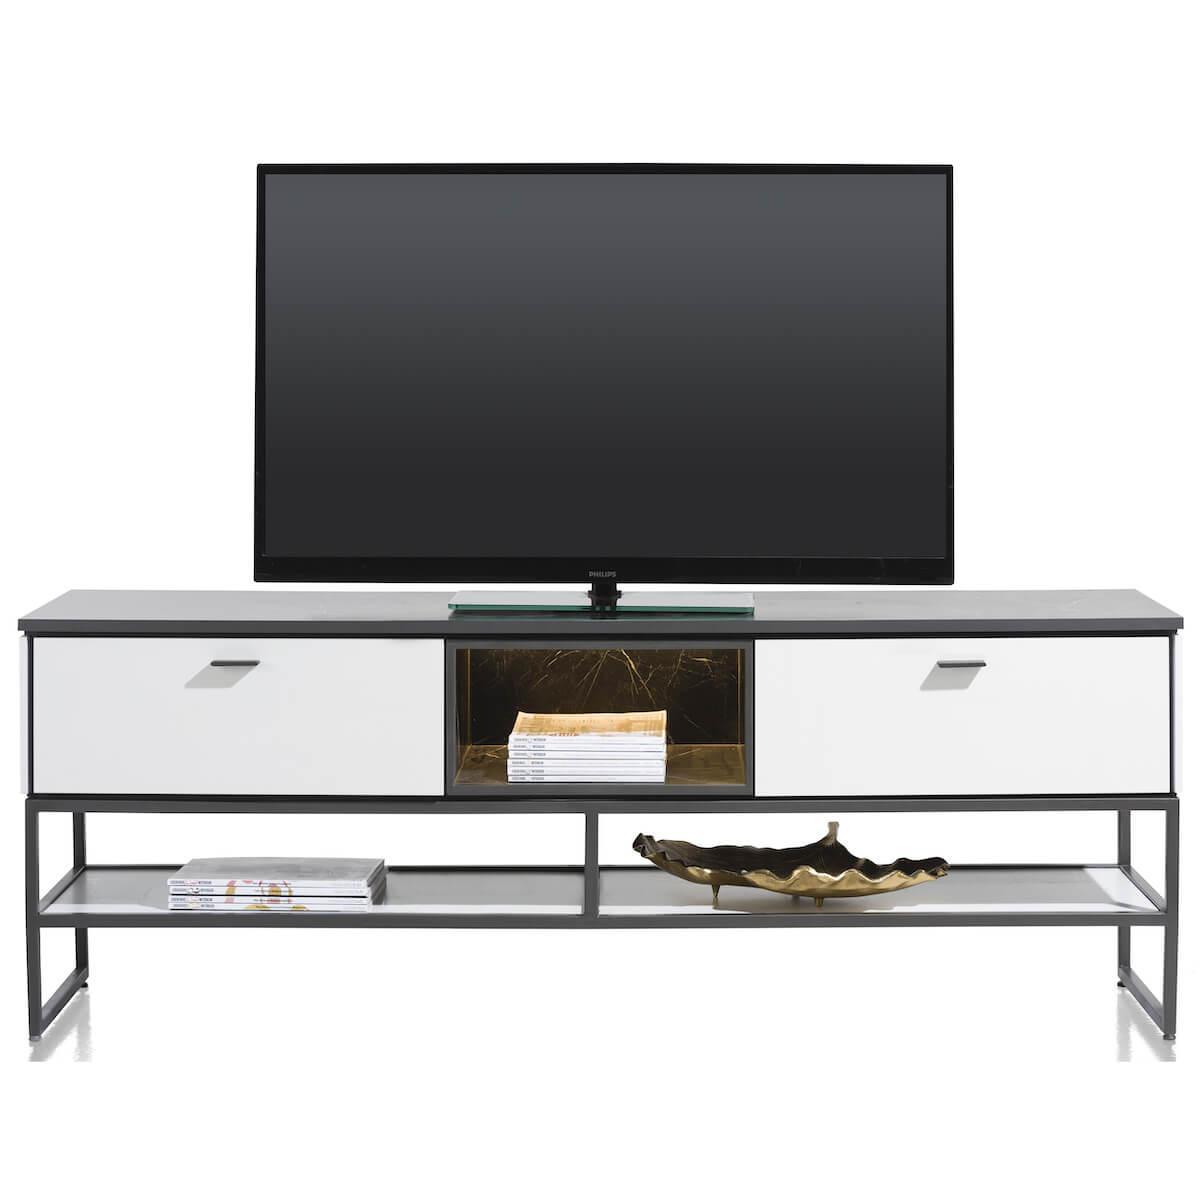 Meuble TV 170cm BOGOTA Xooon